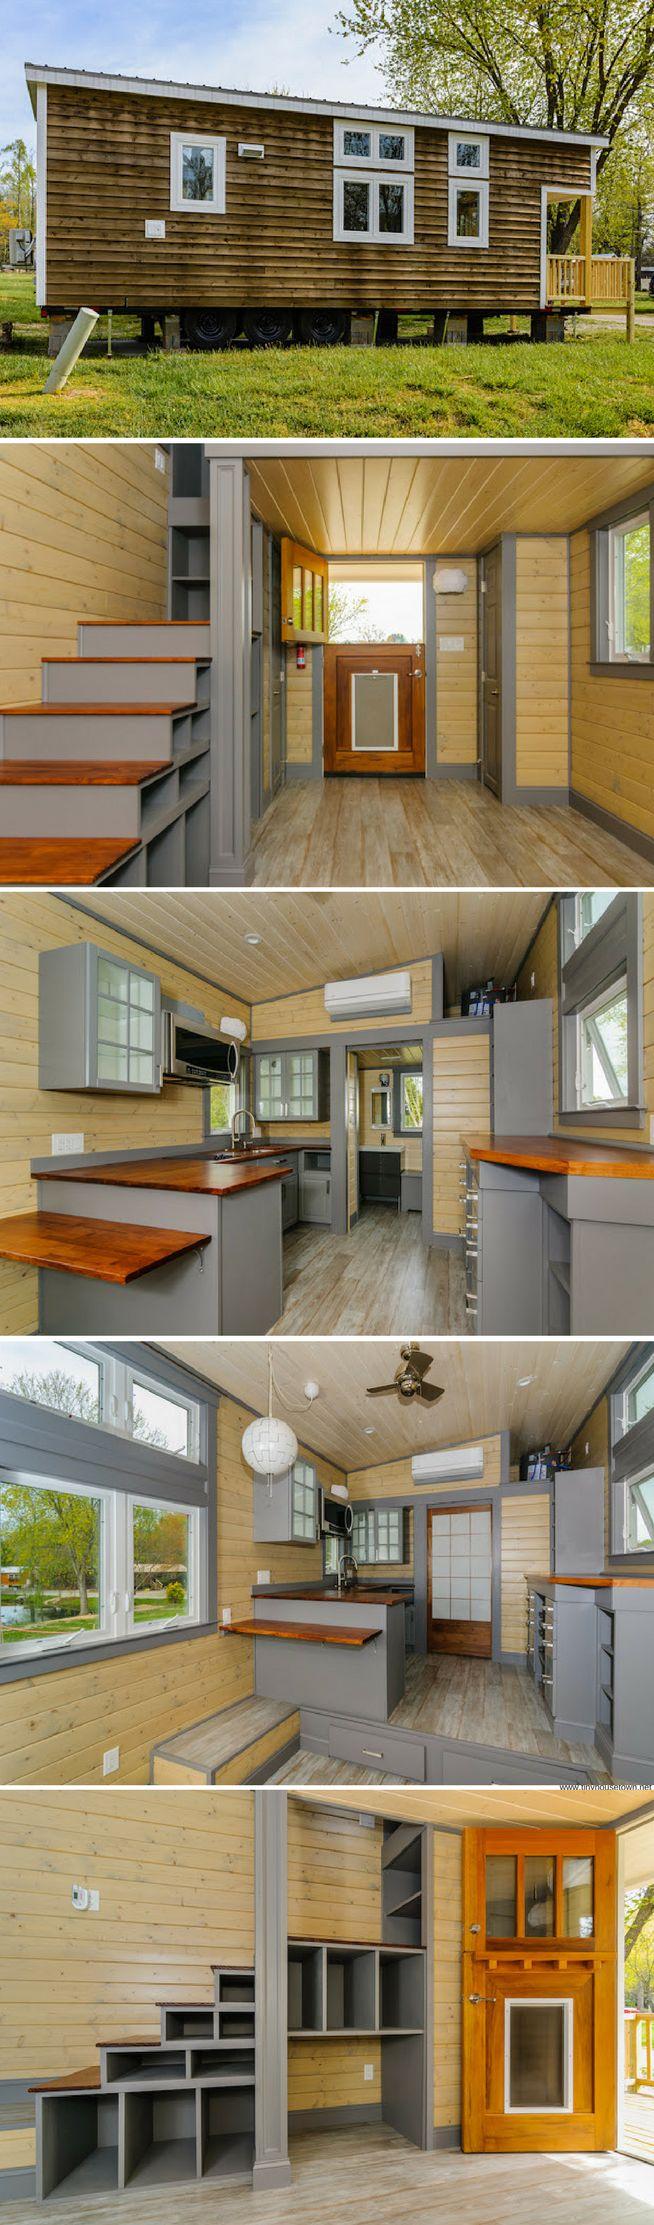 the squibb a 300 sq ft tiny house from wishbone tiny homes - Tiny House Storage Ideas